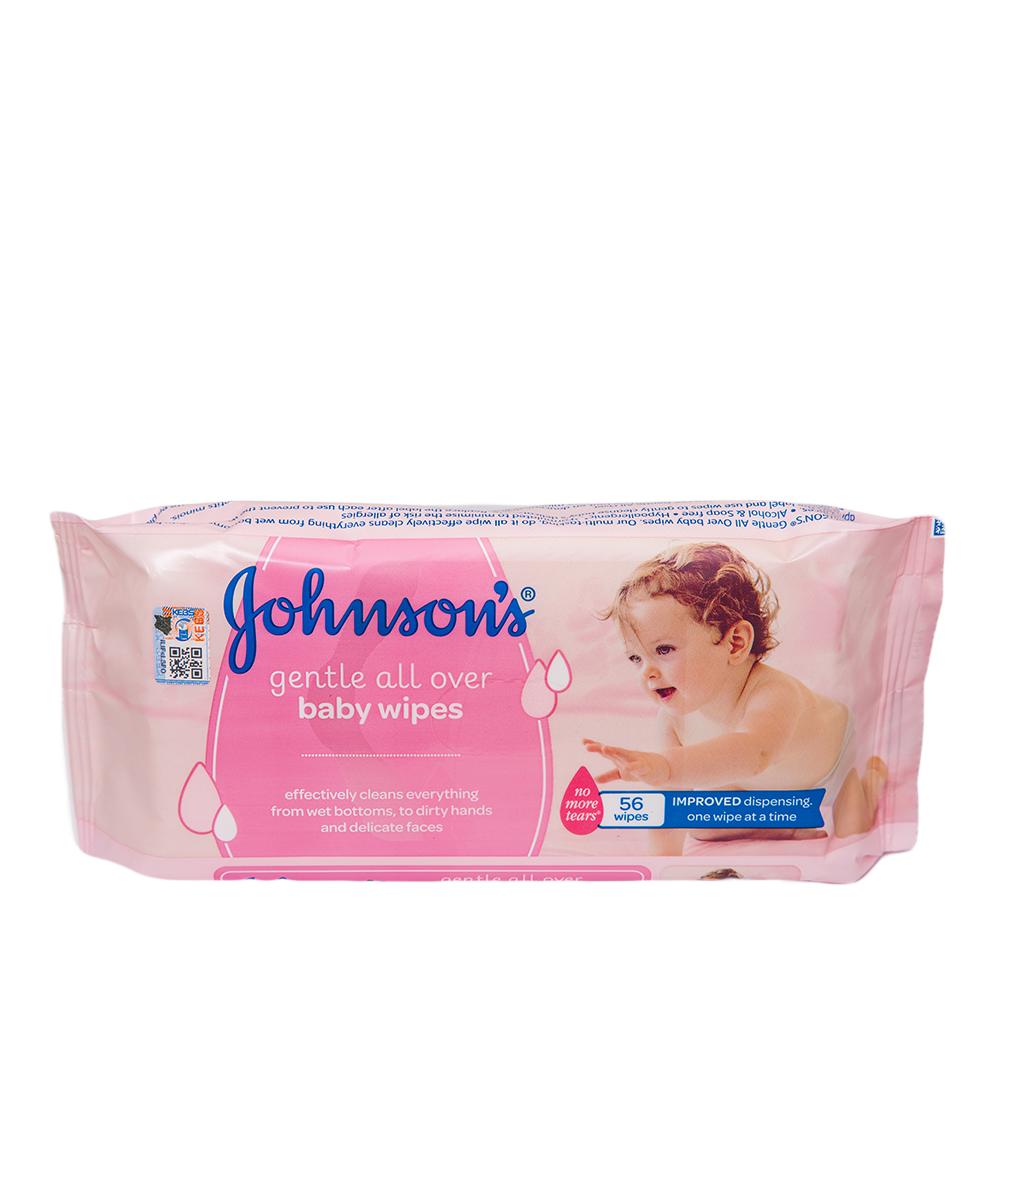 3908c80400b Johnson's Baby Wipes Gentle All Over 56 Pieces   Kasha Kenya